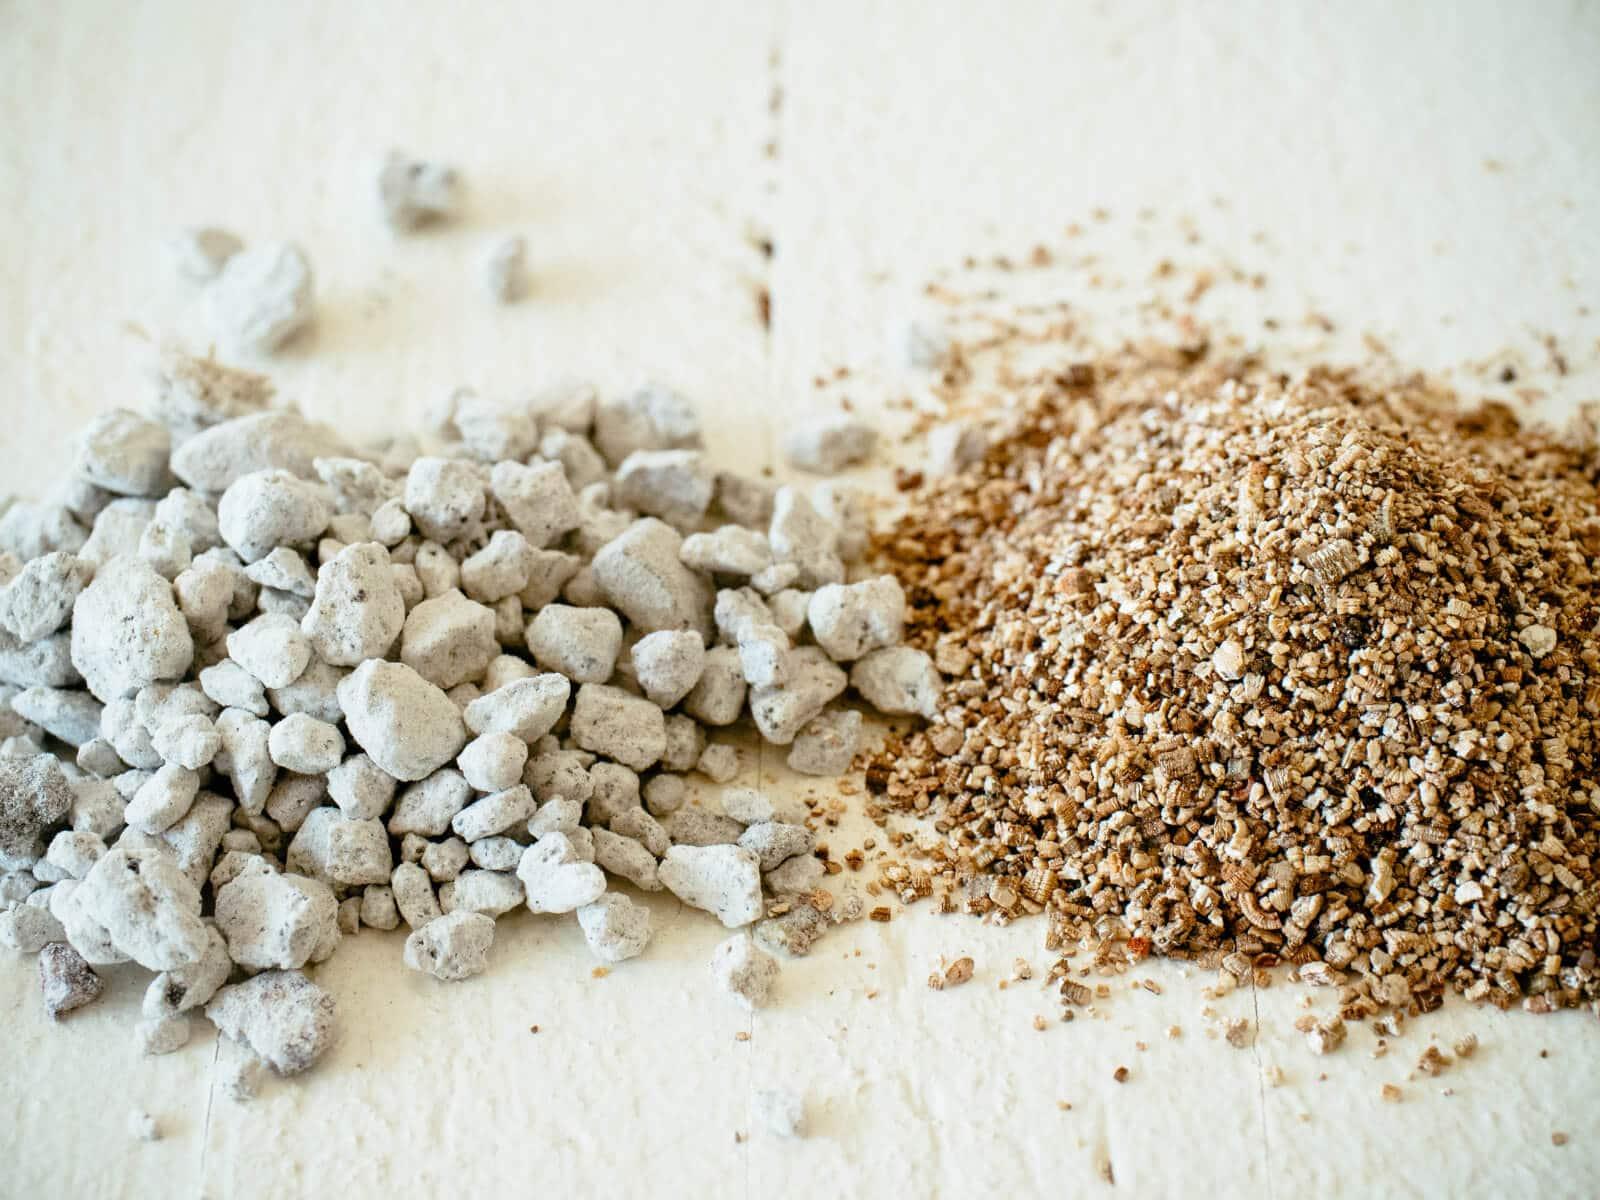 Perlite vs. vermiculite